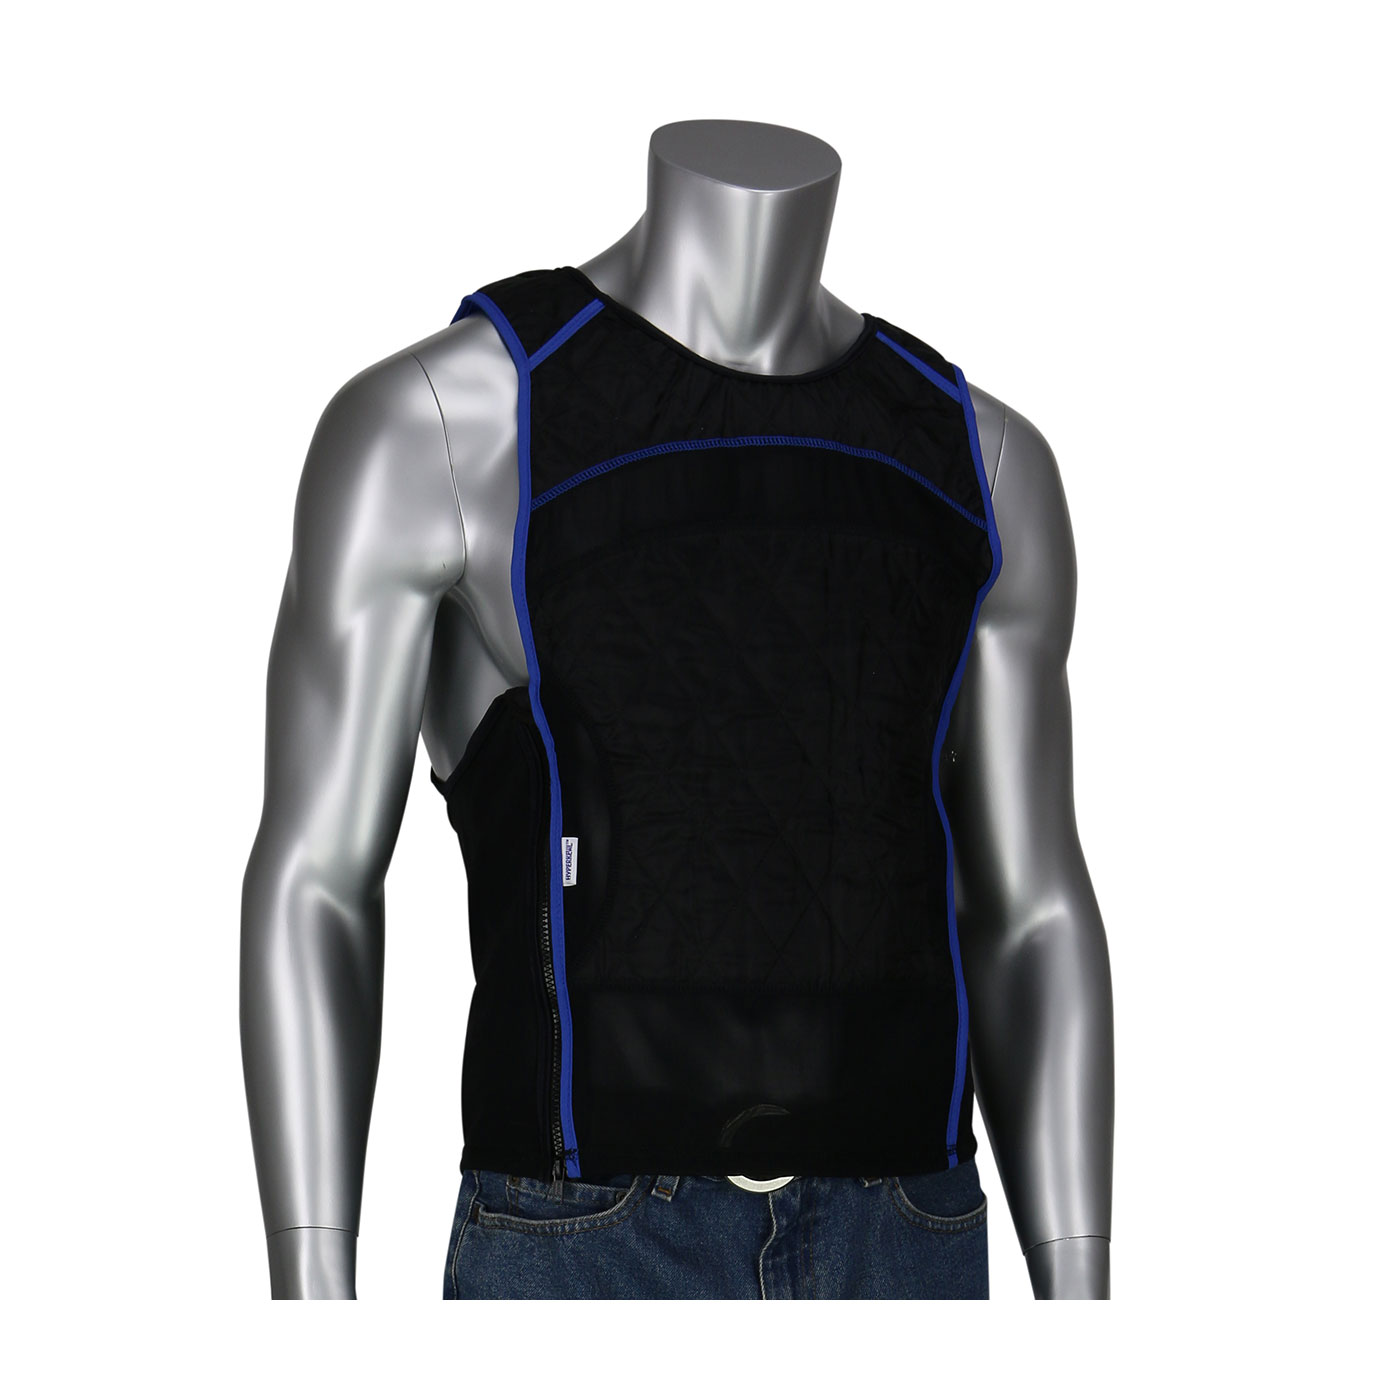 Evaporative Cooling Clothing : Premium evaporative cooling vest protective industrial